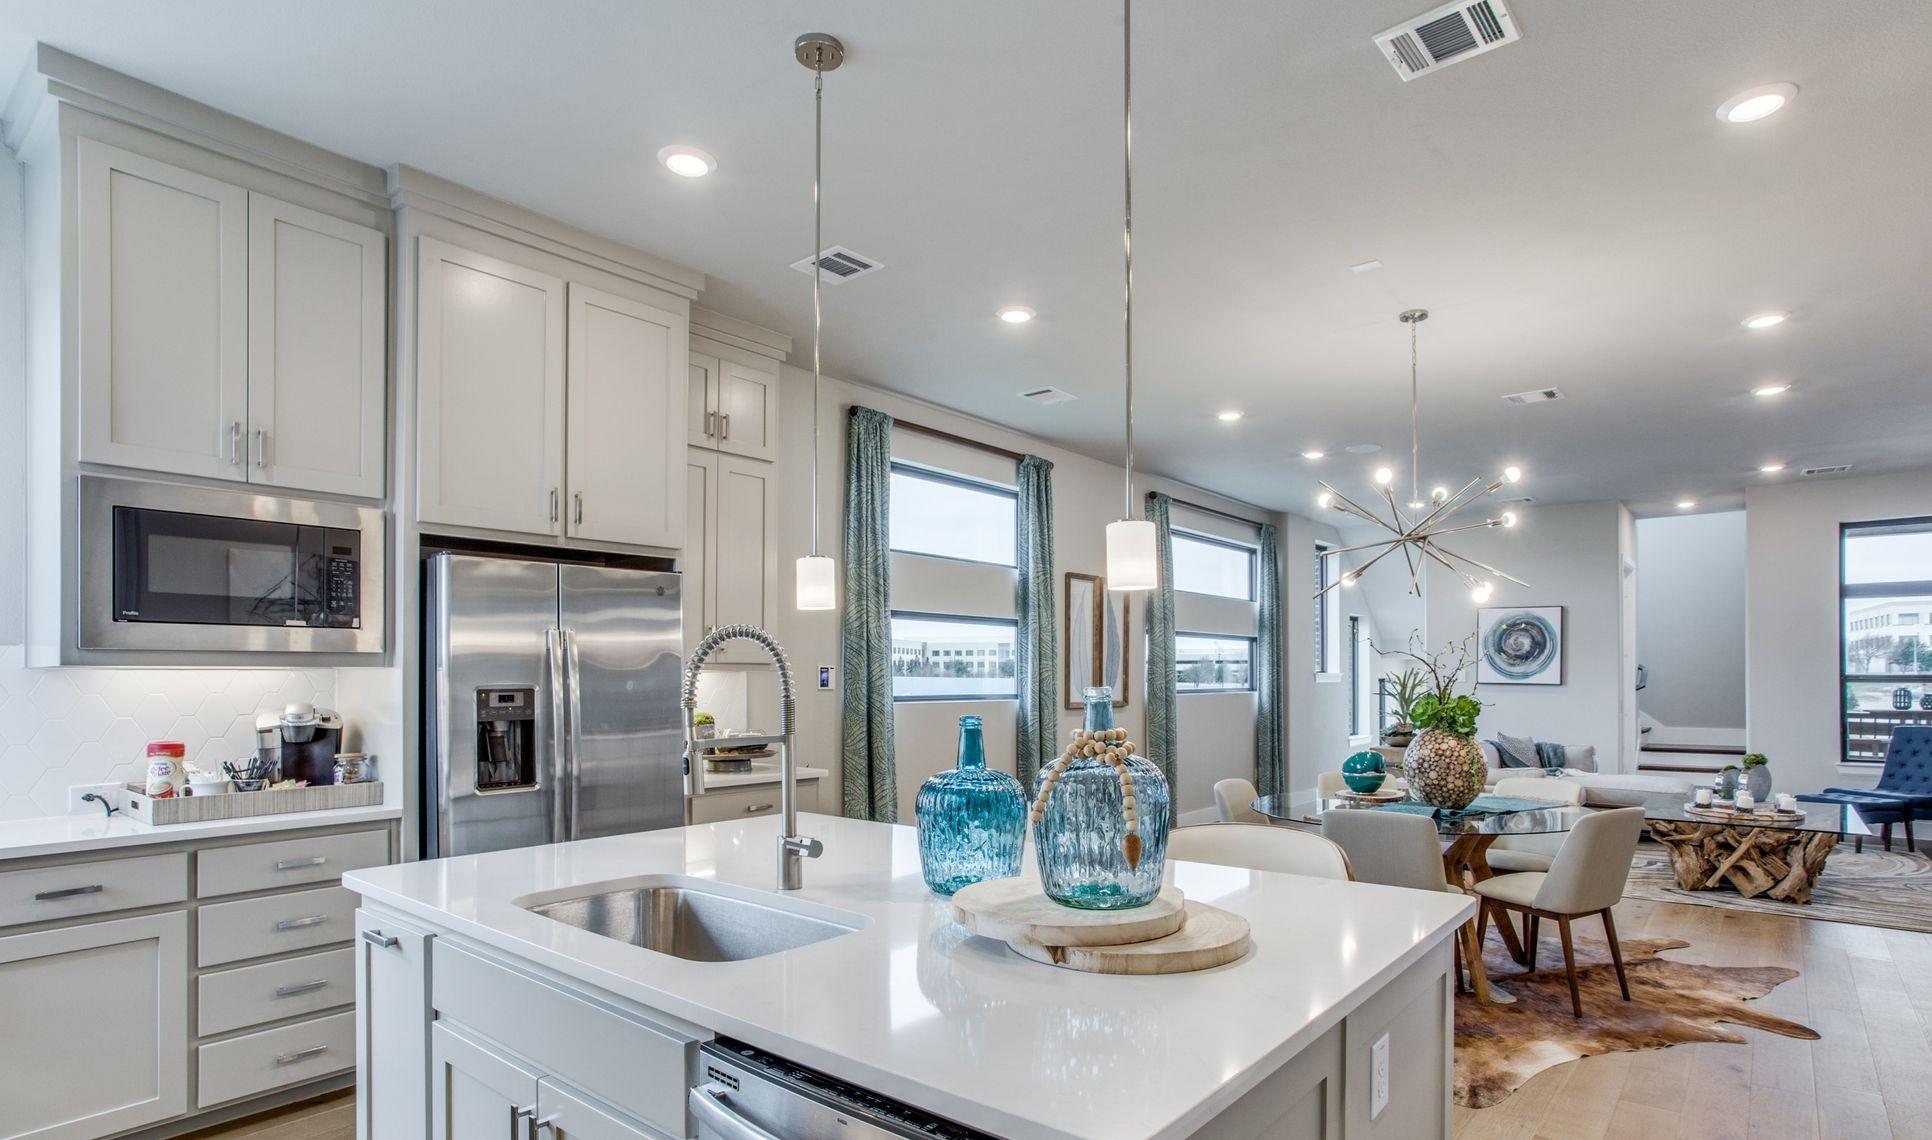 Interior:Large kitchen island